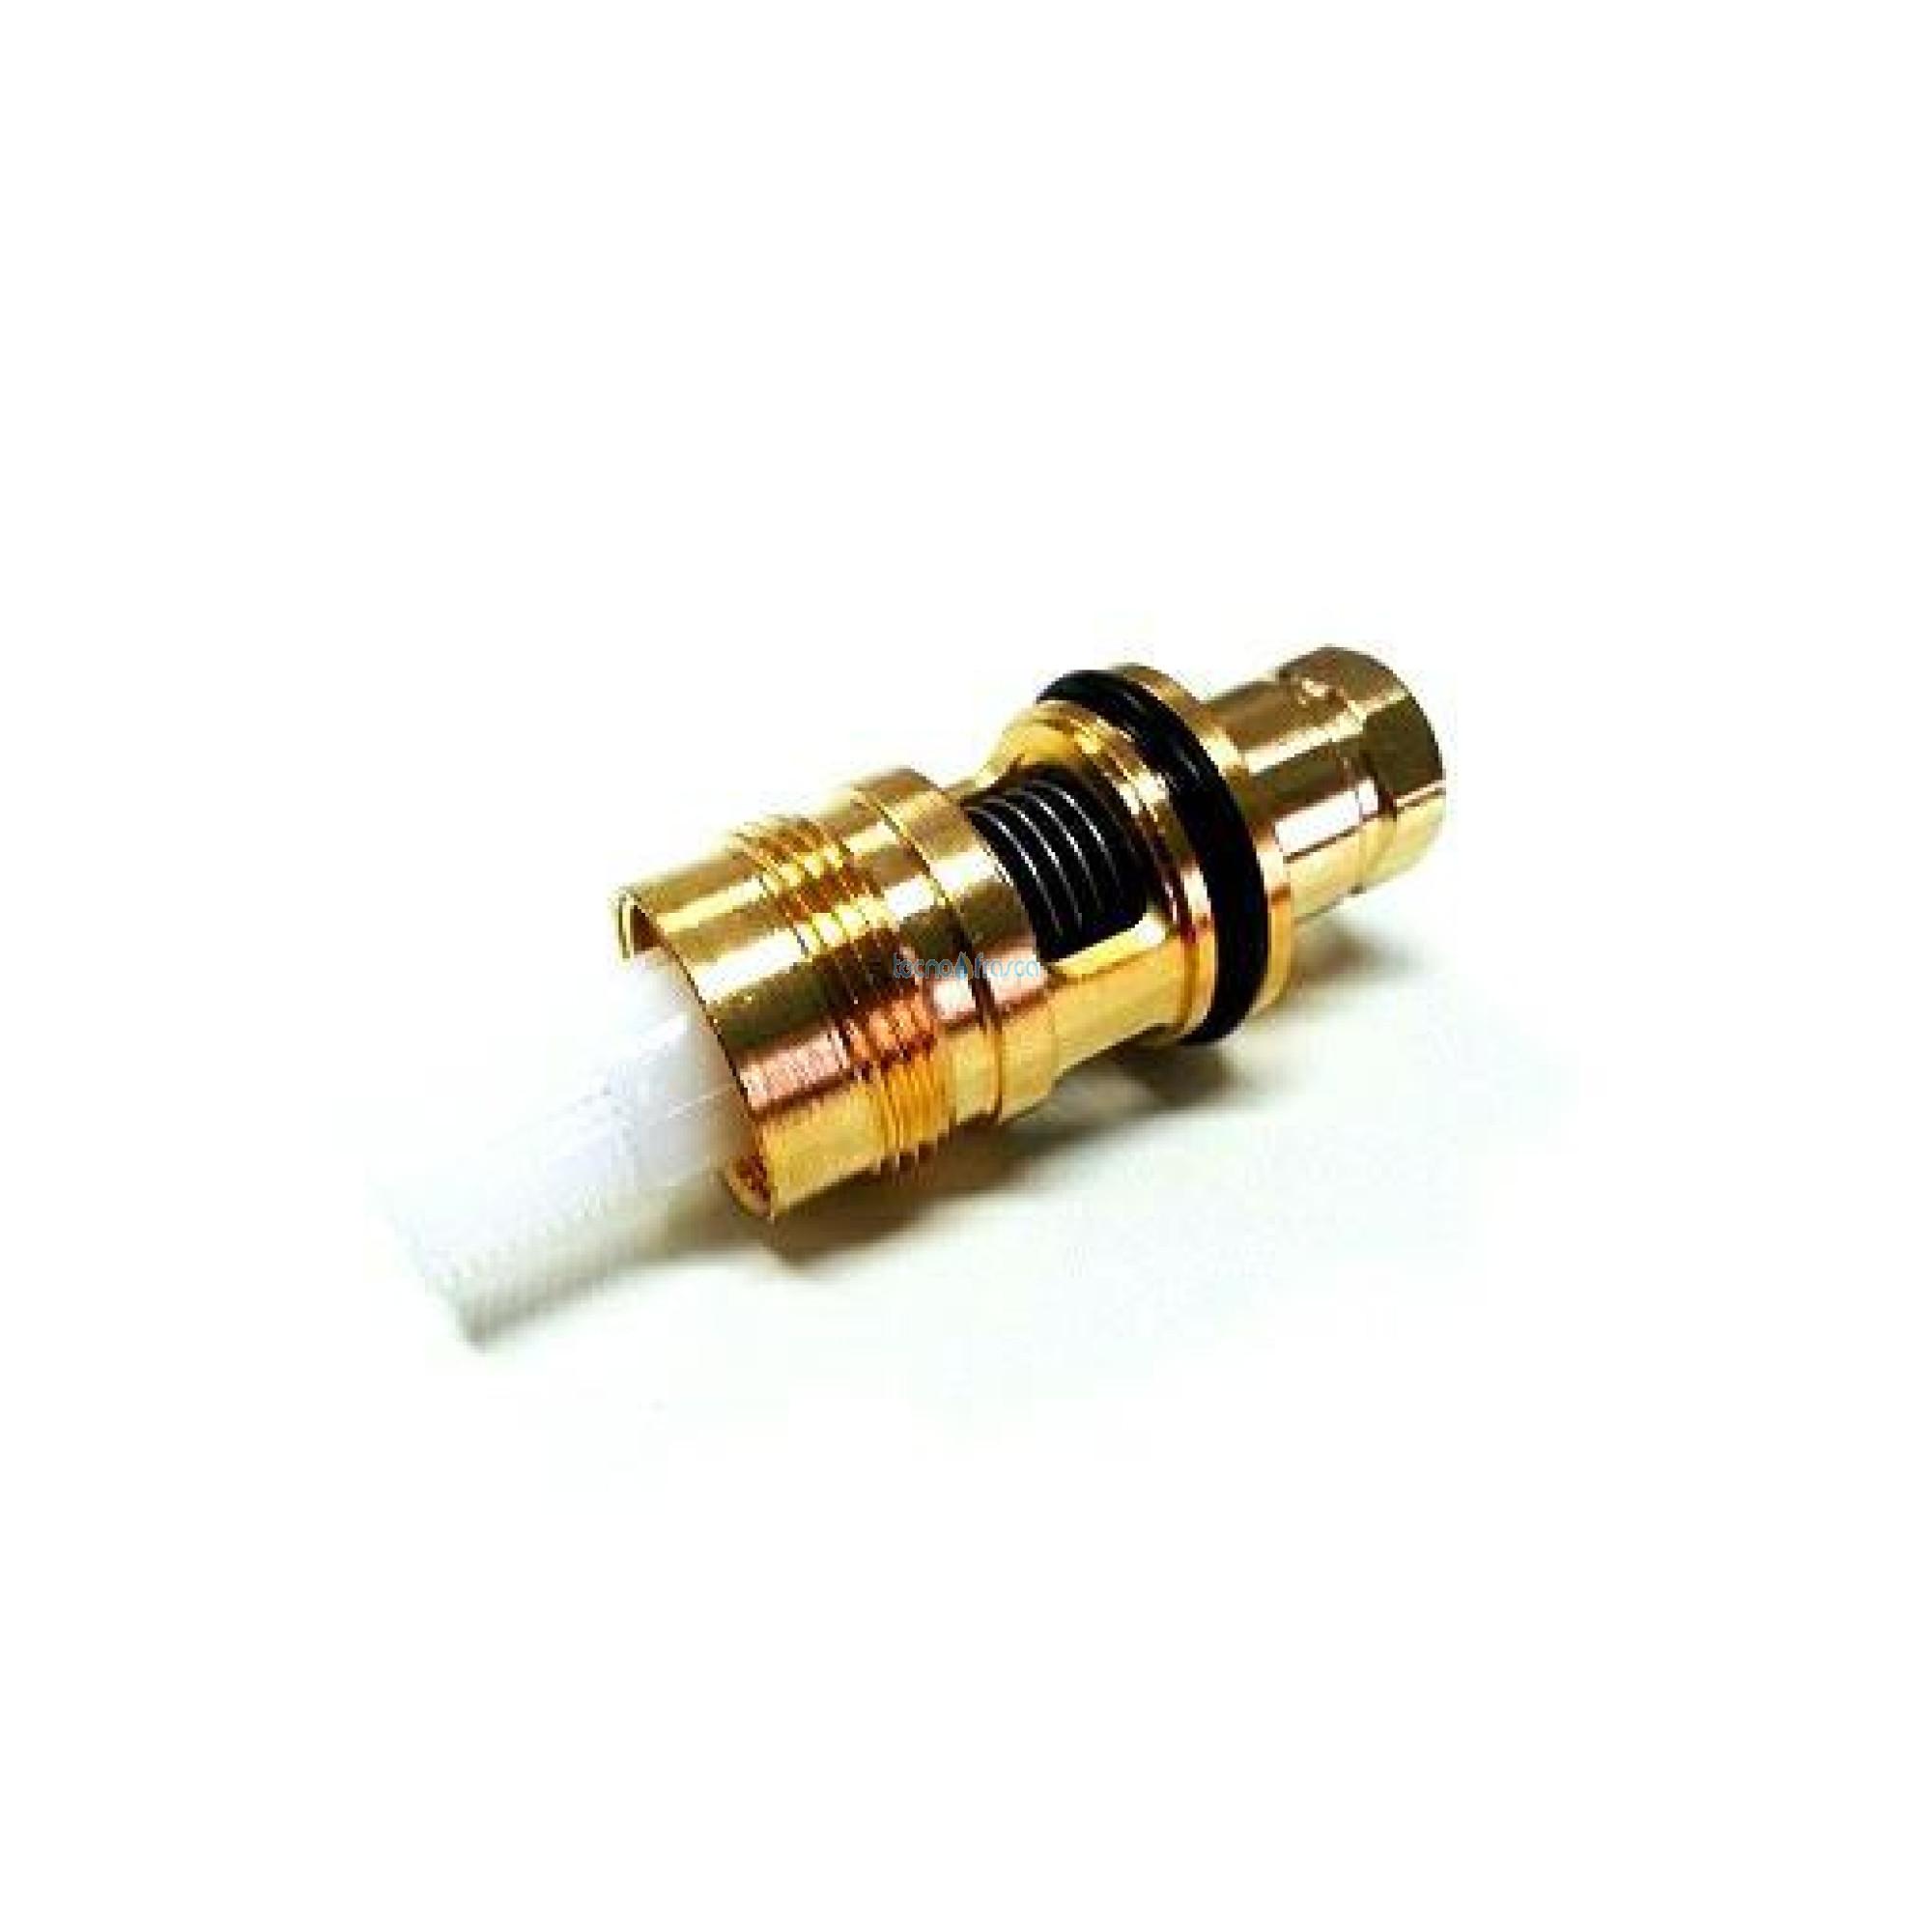 Savio biasi flussostato magnetico sanitario m97 caldaia bi1271501